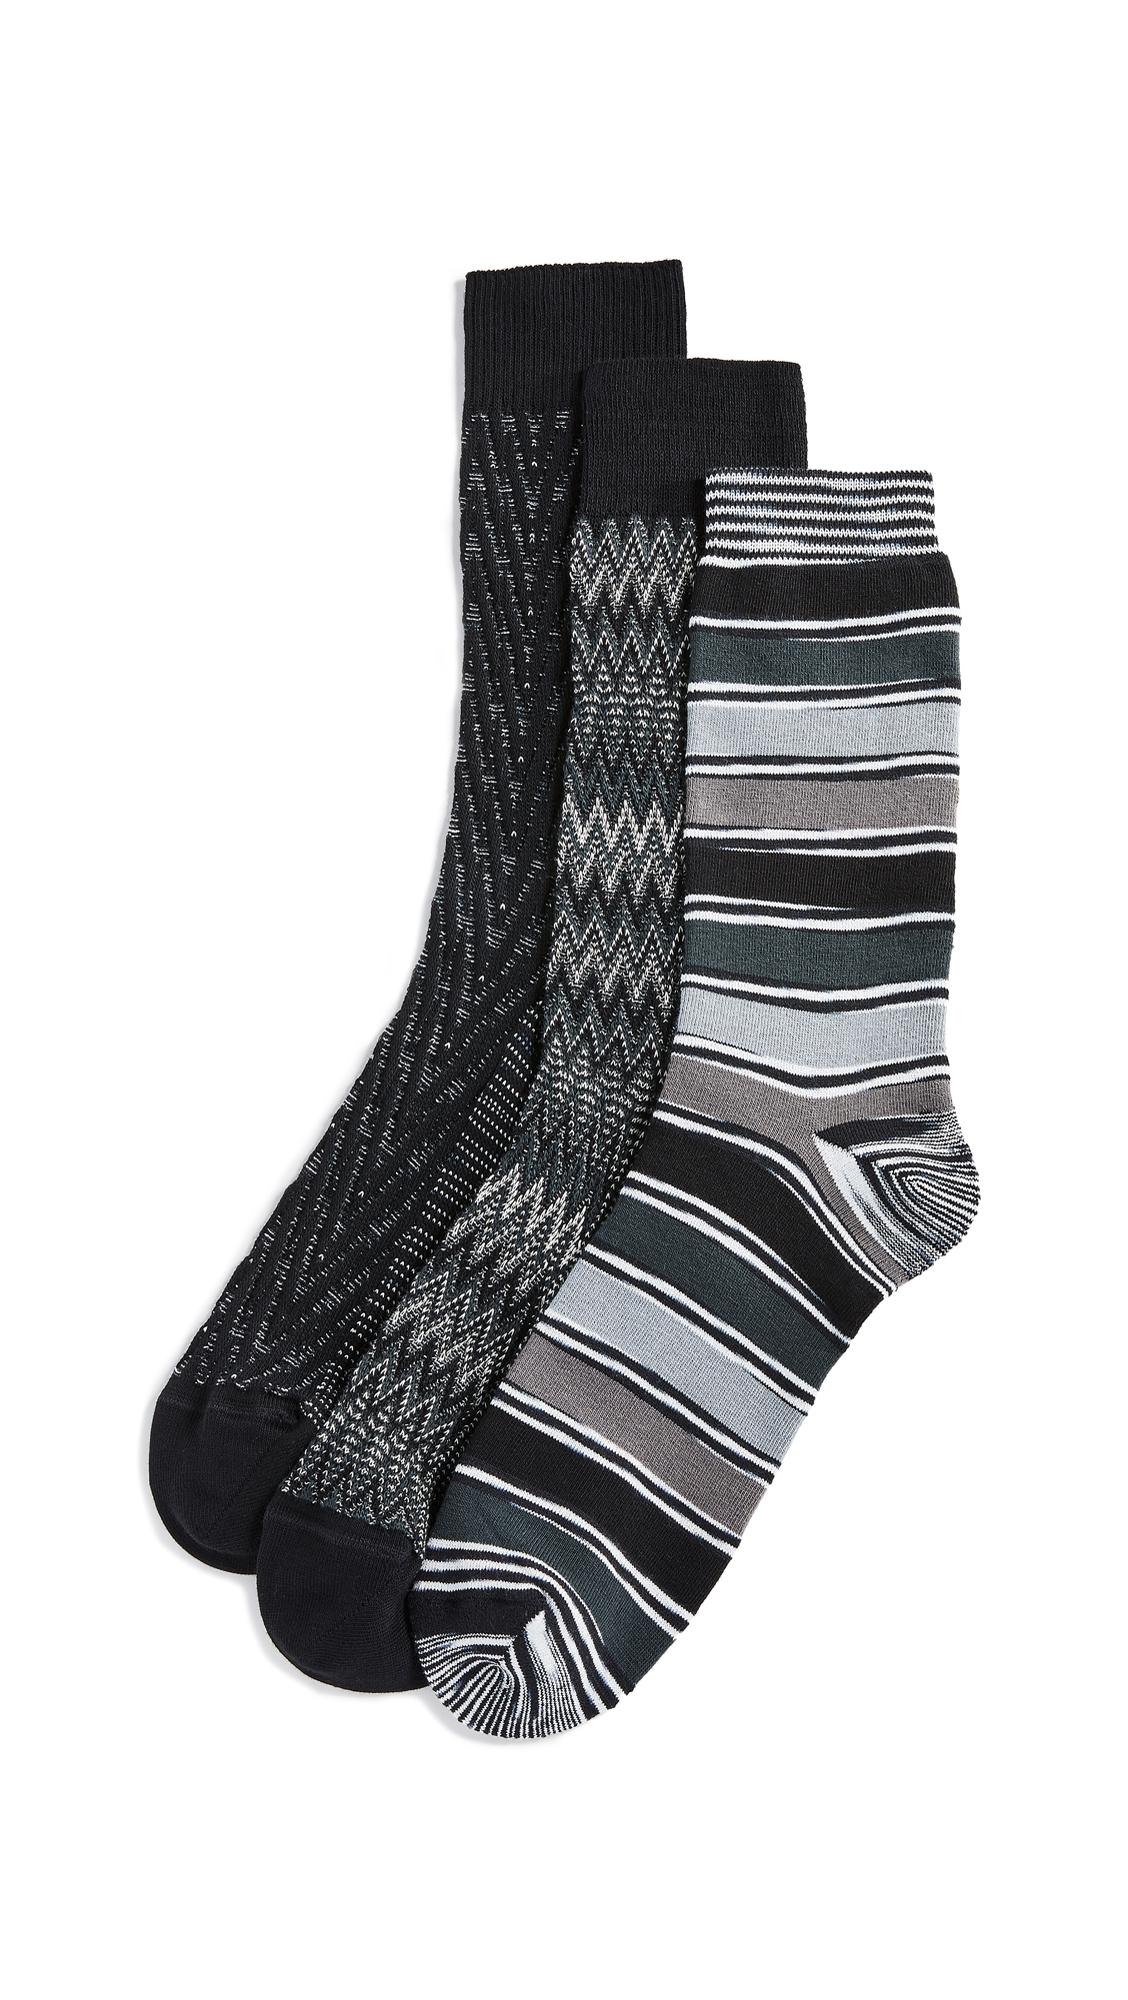 Missoni Trio Socks Gift Box - Black Multi